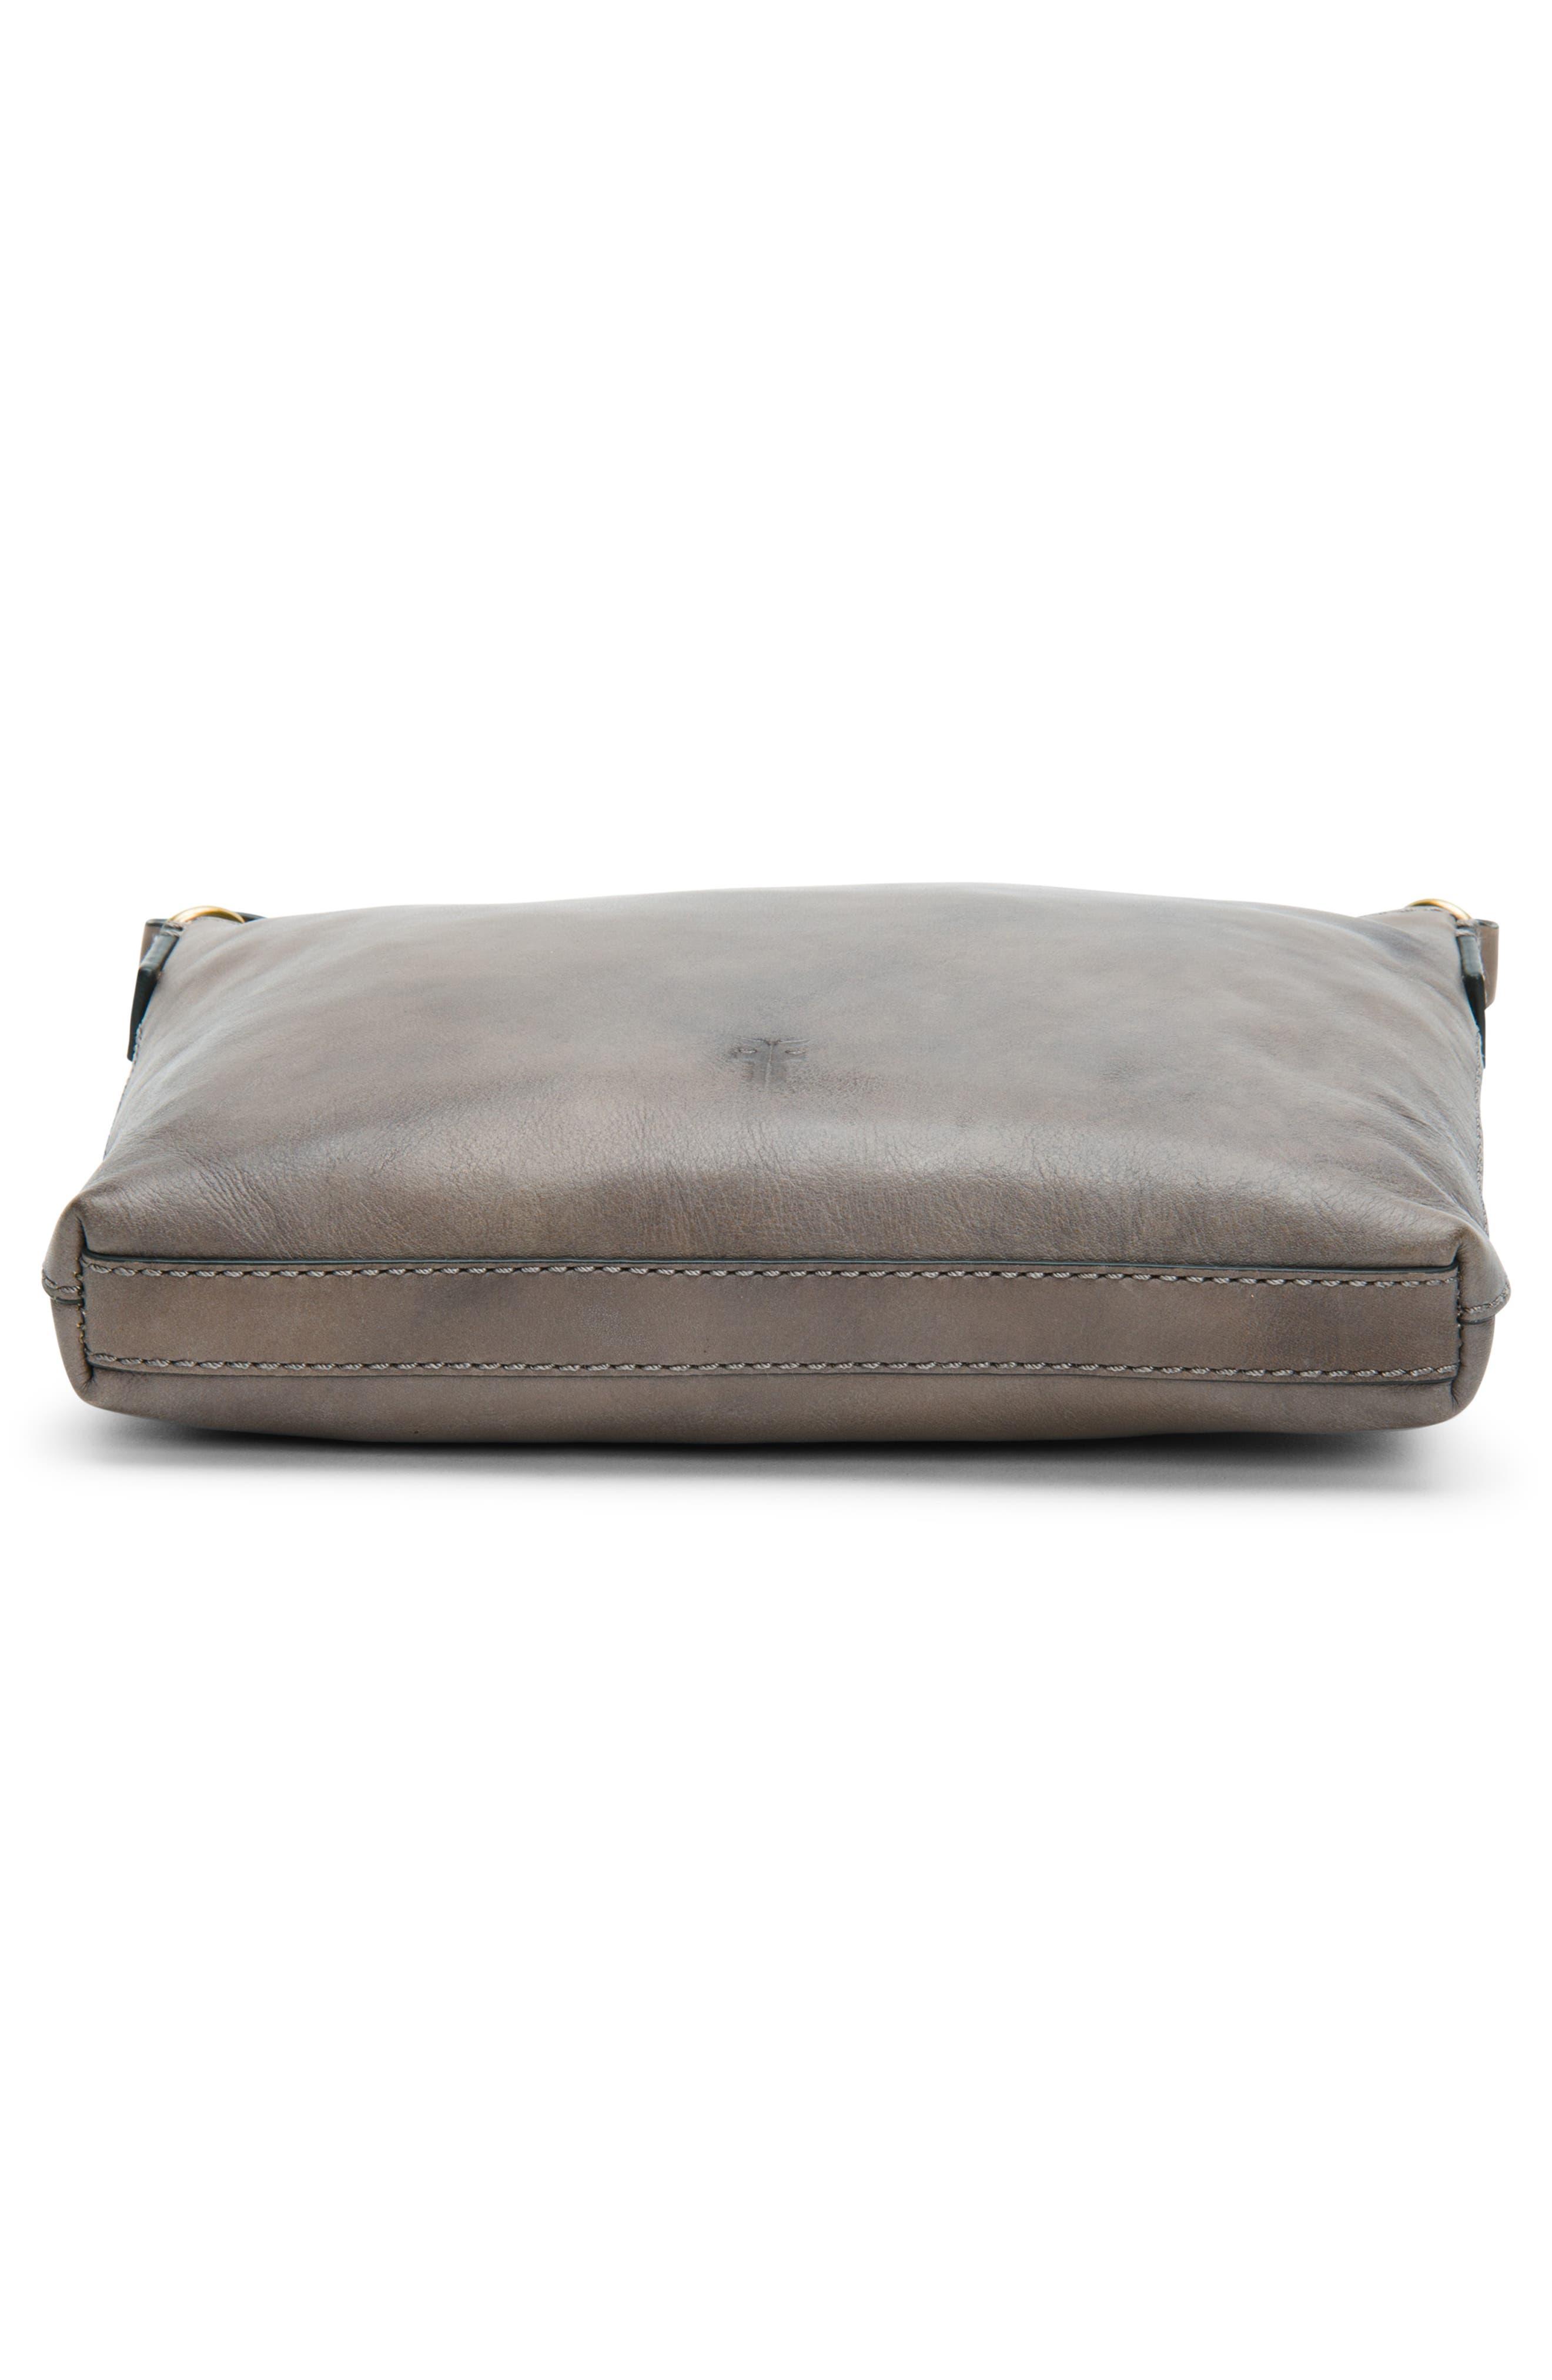 Carson Leather Crossbody Bag,                             Alternate thumbnail 6, color,                             GREY